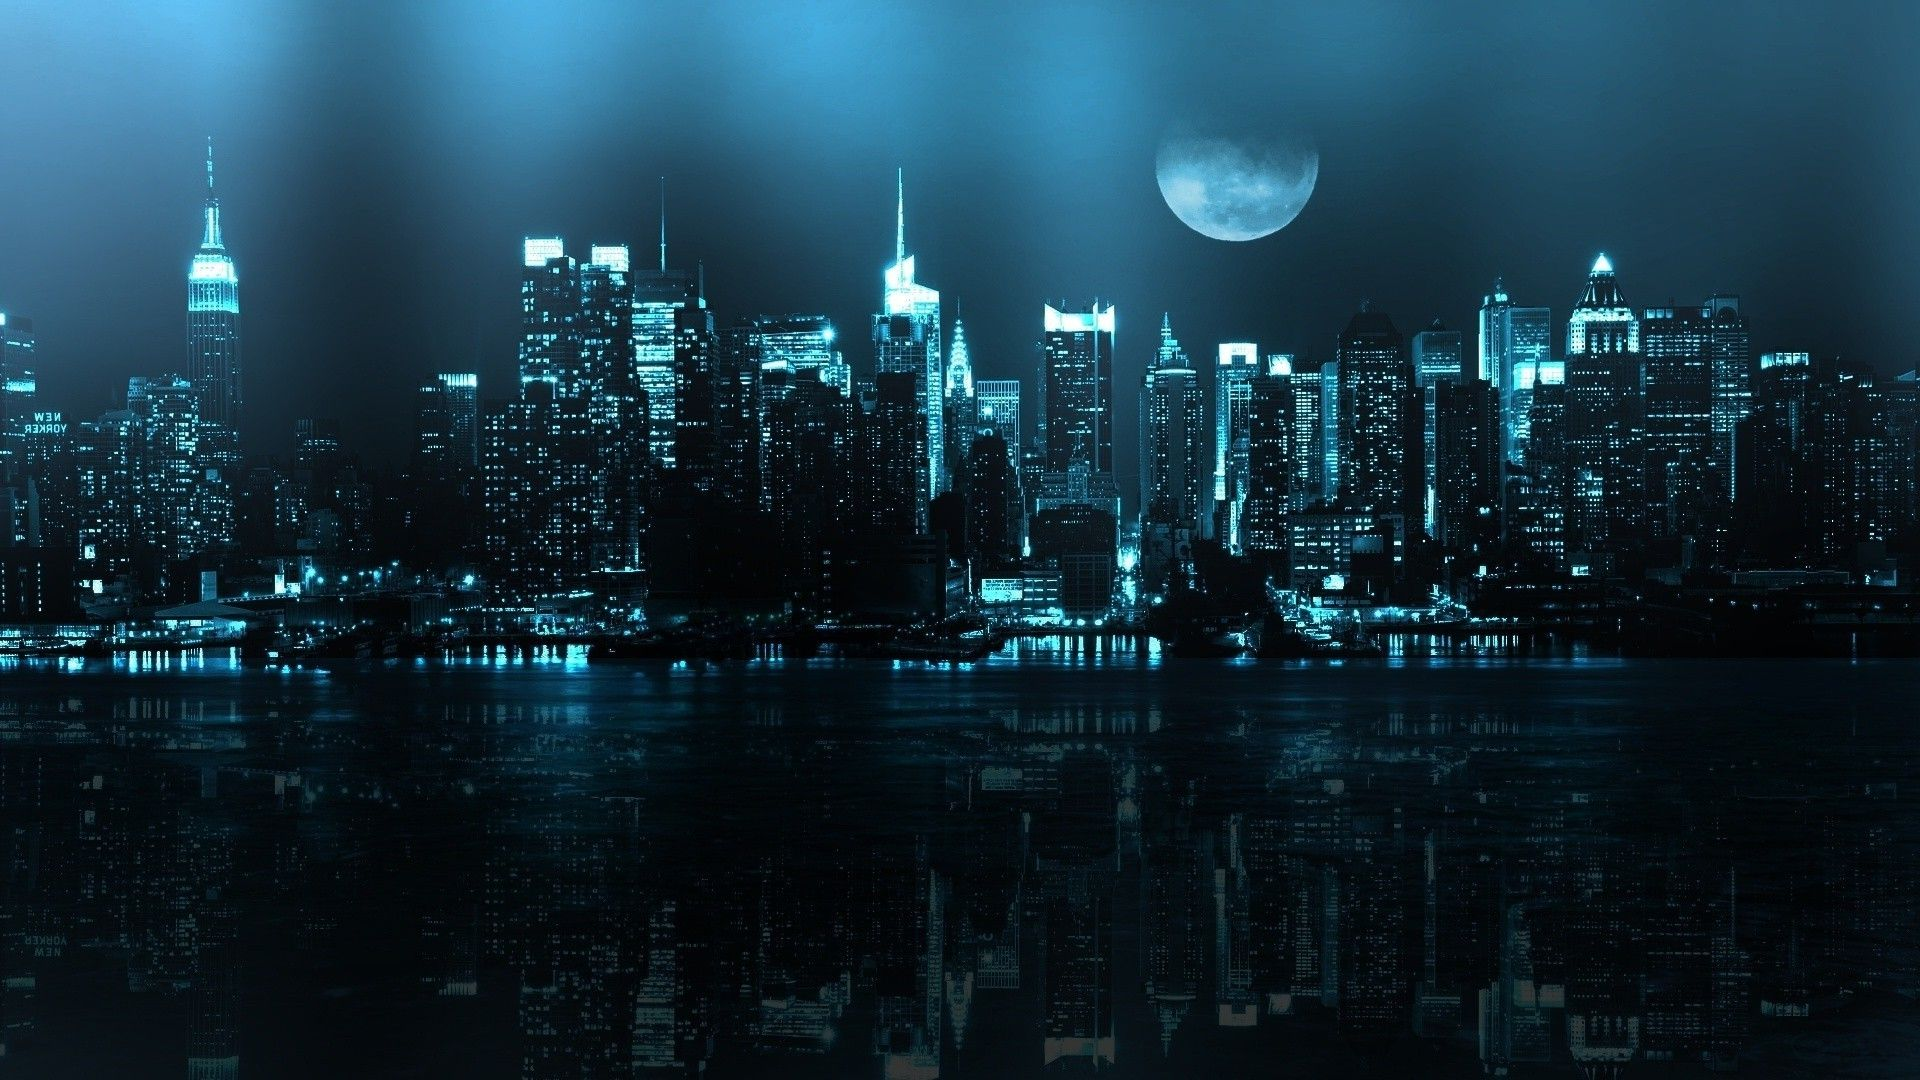 Blue Moon Night Cityscape Wallpaper Cool Desktop Backgrounds City Wallpaper